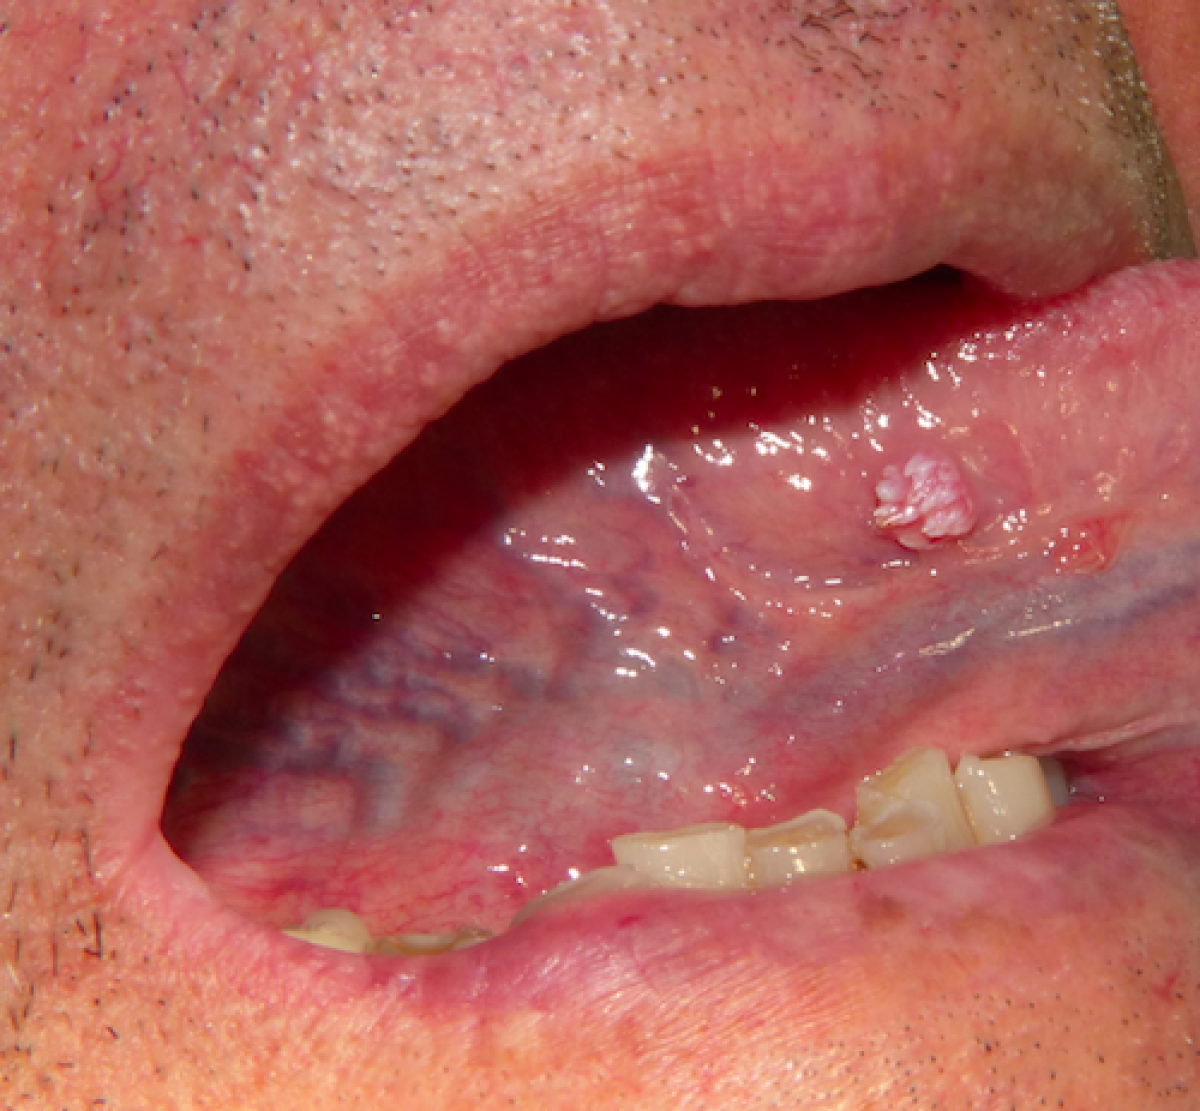 papillary lesion under tongue)